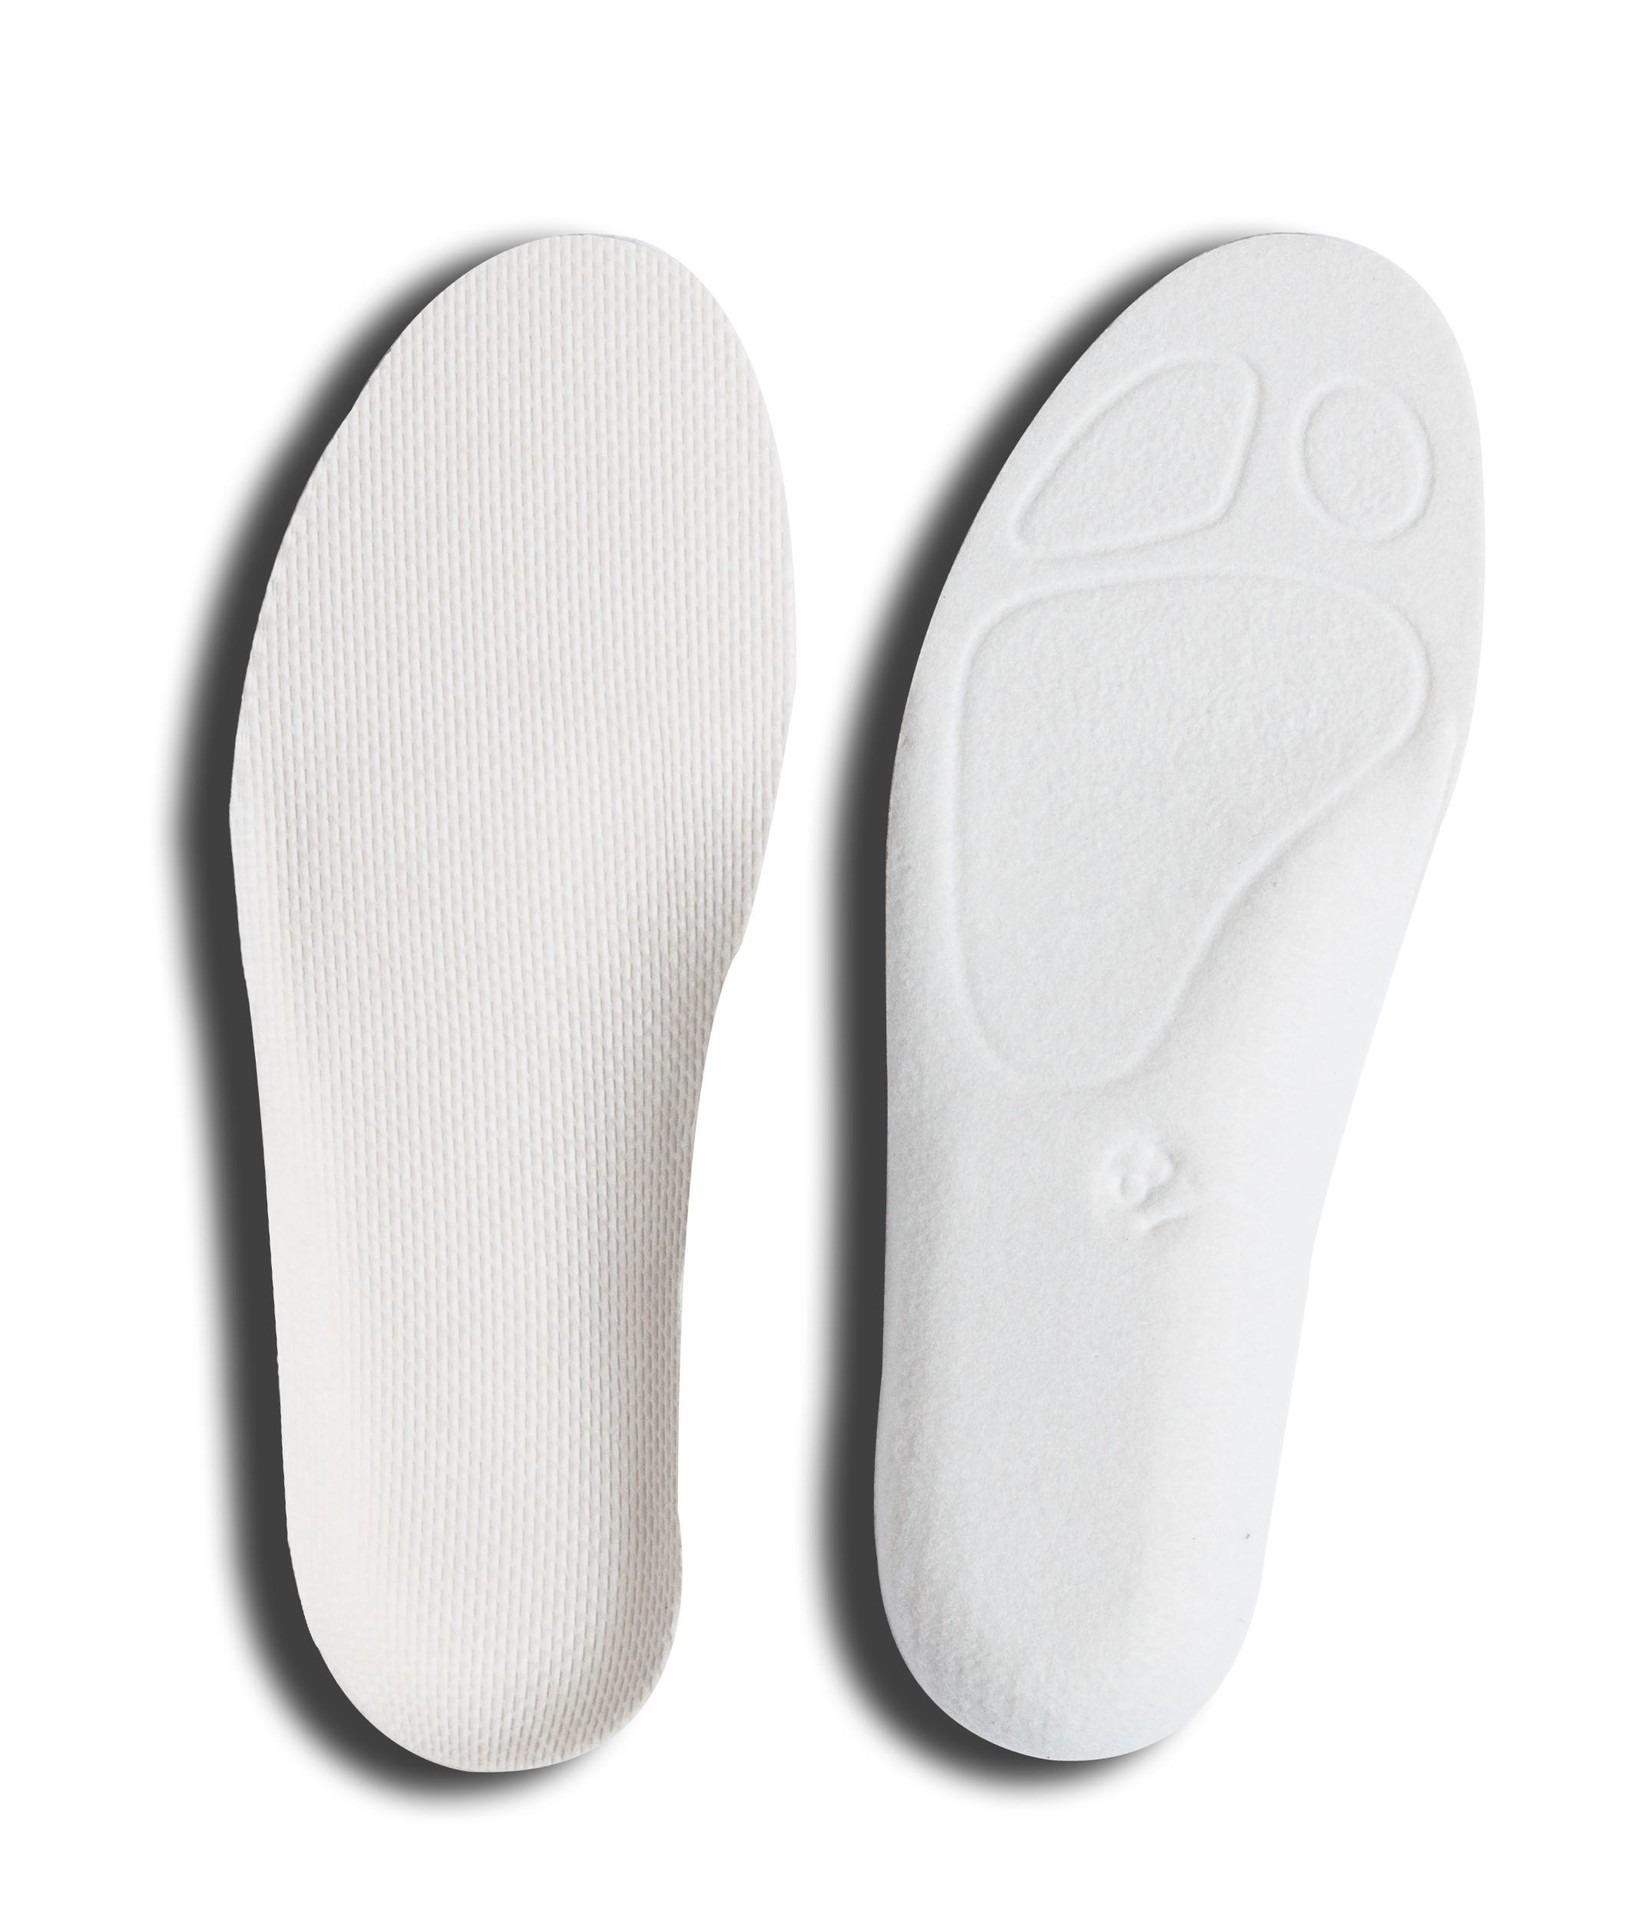 Moneta - Shoes manufacturers 4da15b5cf4e